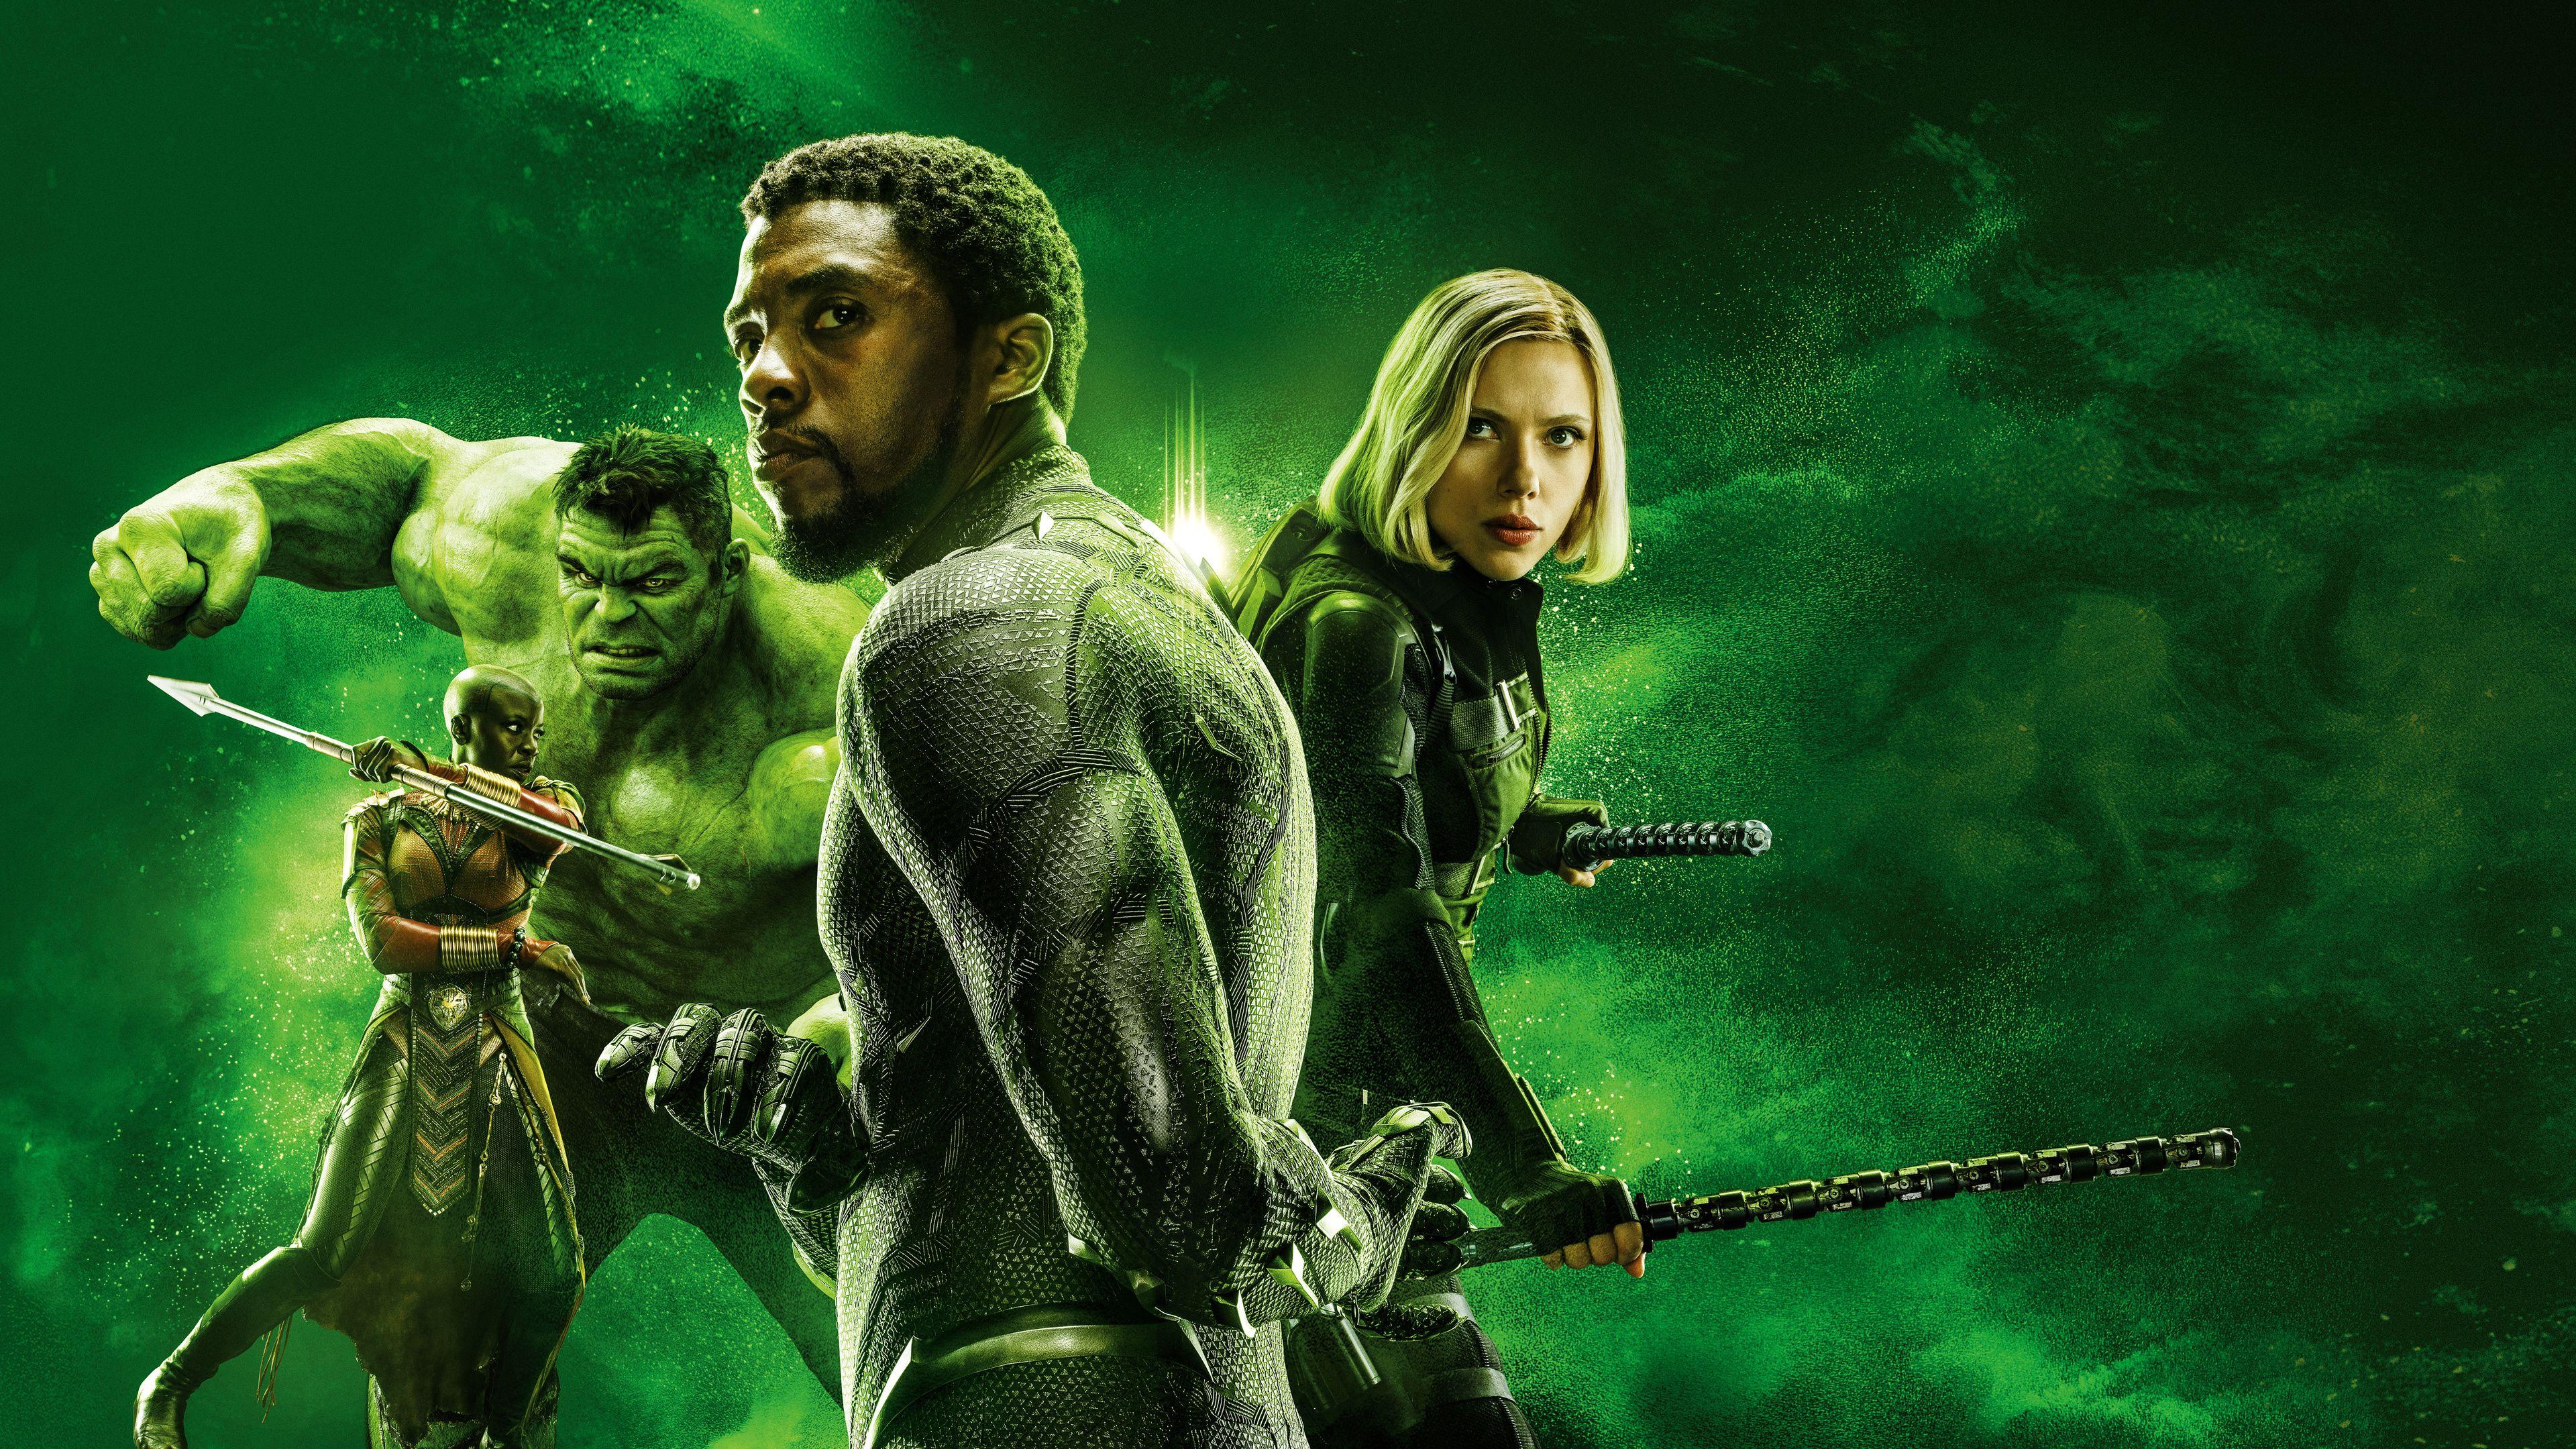 Avengers Infinity War Time Stone Poster 4k Poster Wallpapers Movies Wallpapers Hulk Wallpapers Hd Wallpapers B Avengers Black Panther Avengers Infinity War